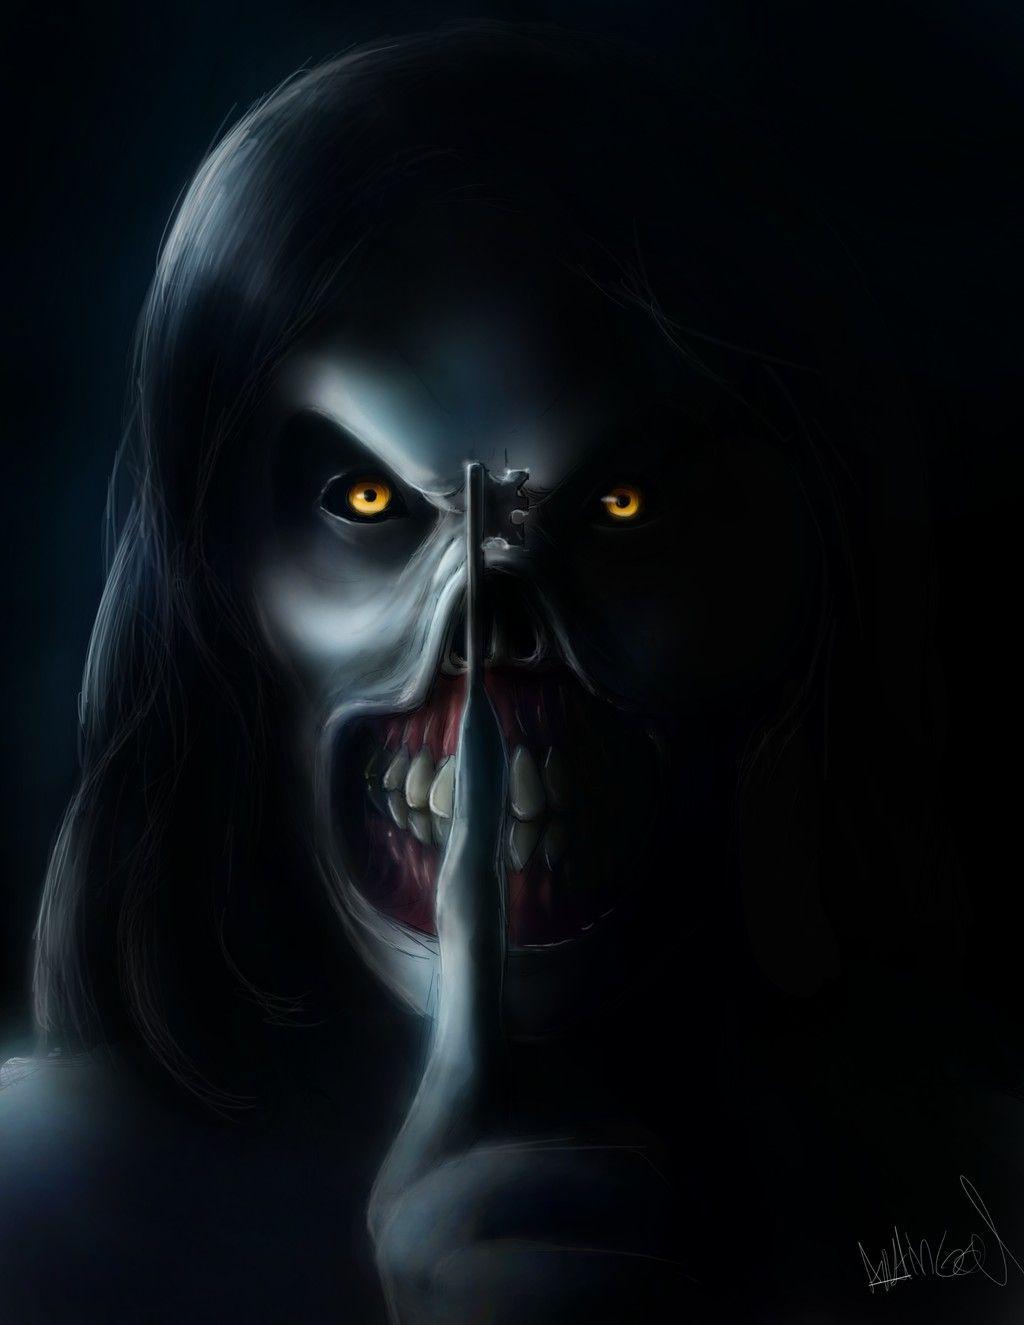 Horror Movie Art Insidious The Last Key 2018 By Thewebsurfer97